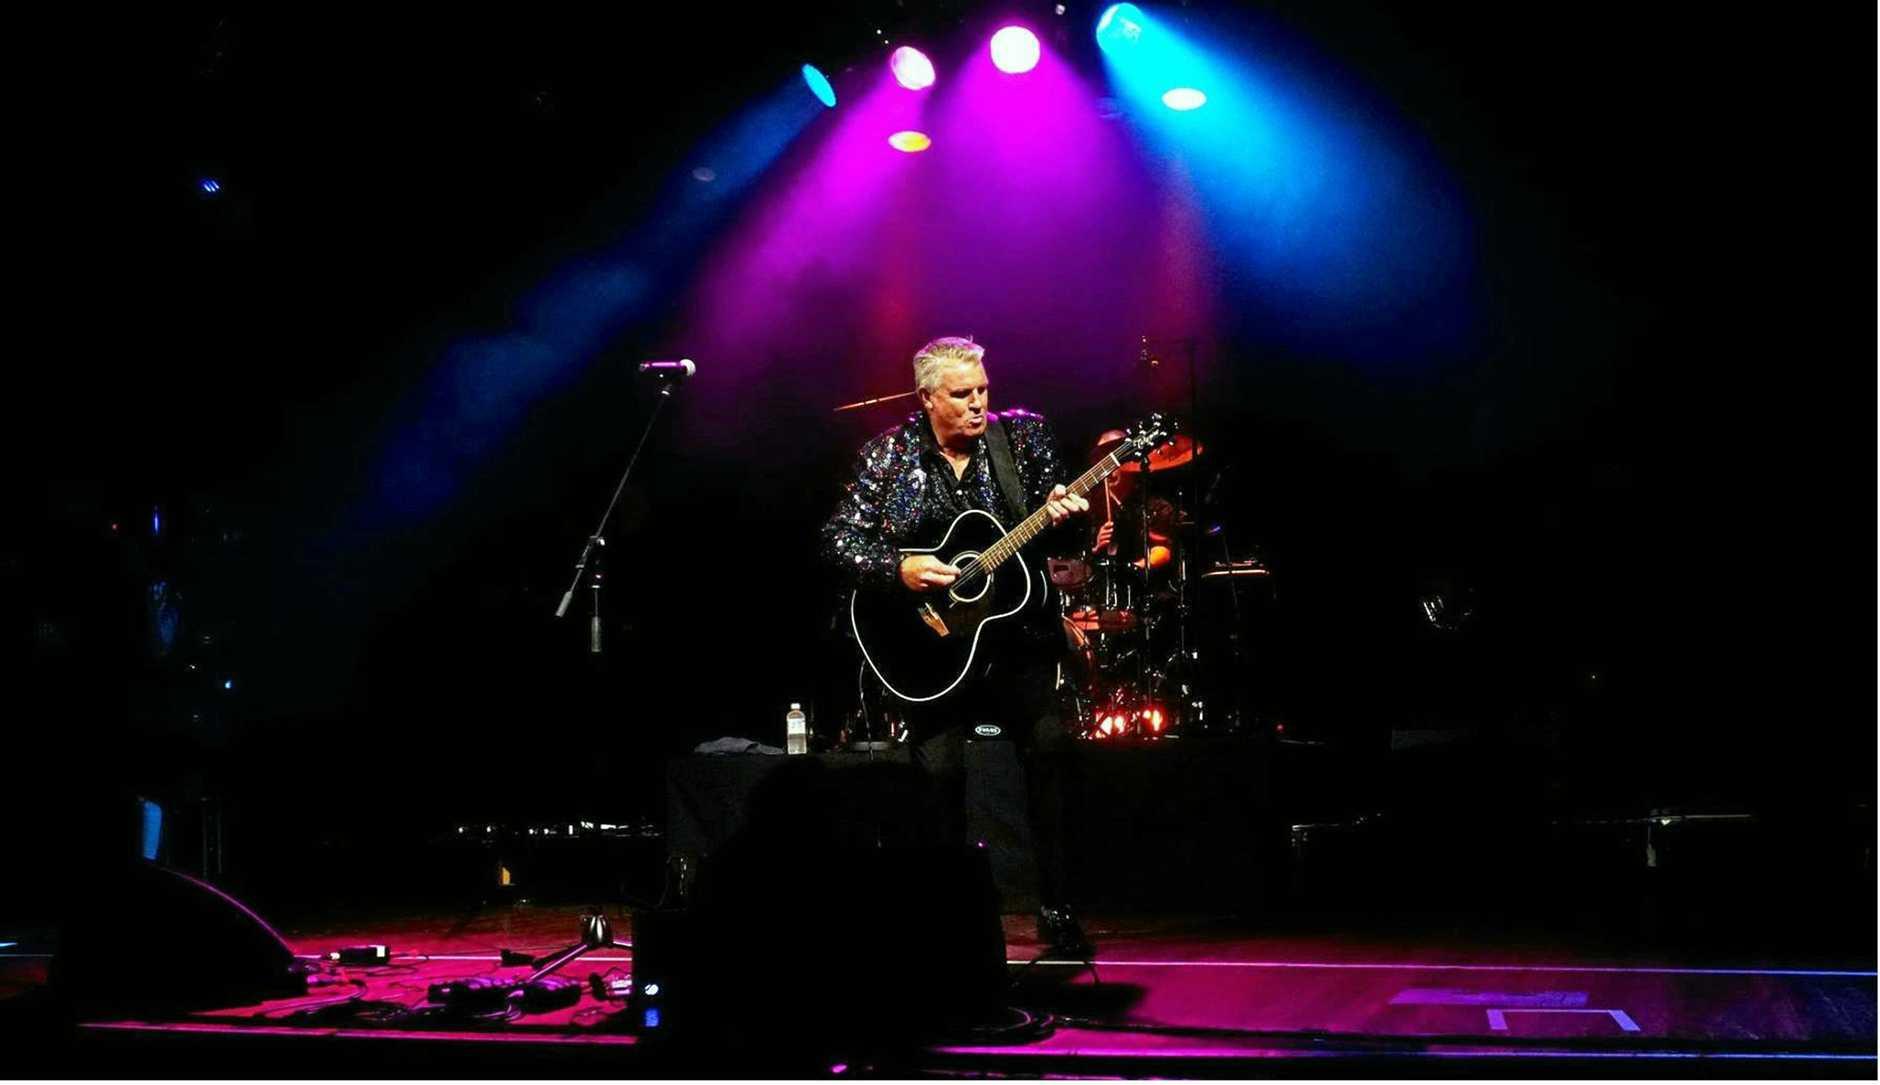 HOT JUNE NIGHT: Australian singer Steve Cummins brings his Neil Diamond Tribute Show to Club Services Ipswich on June 22.